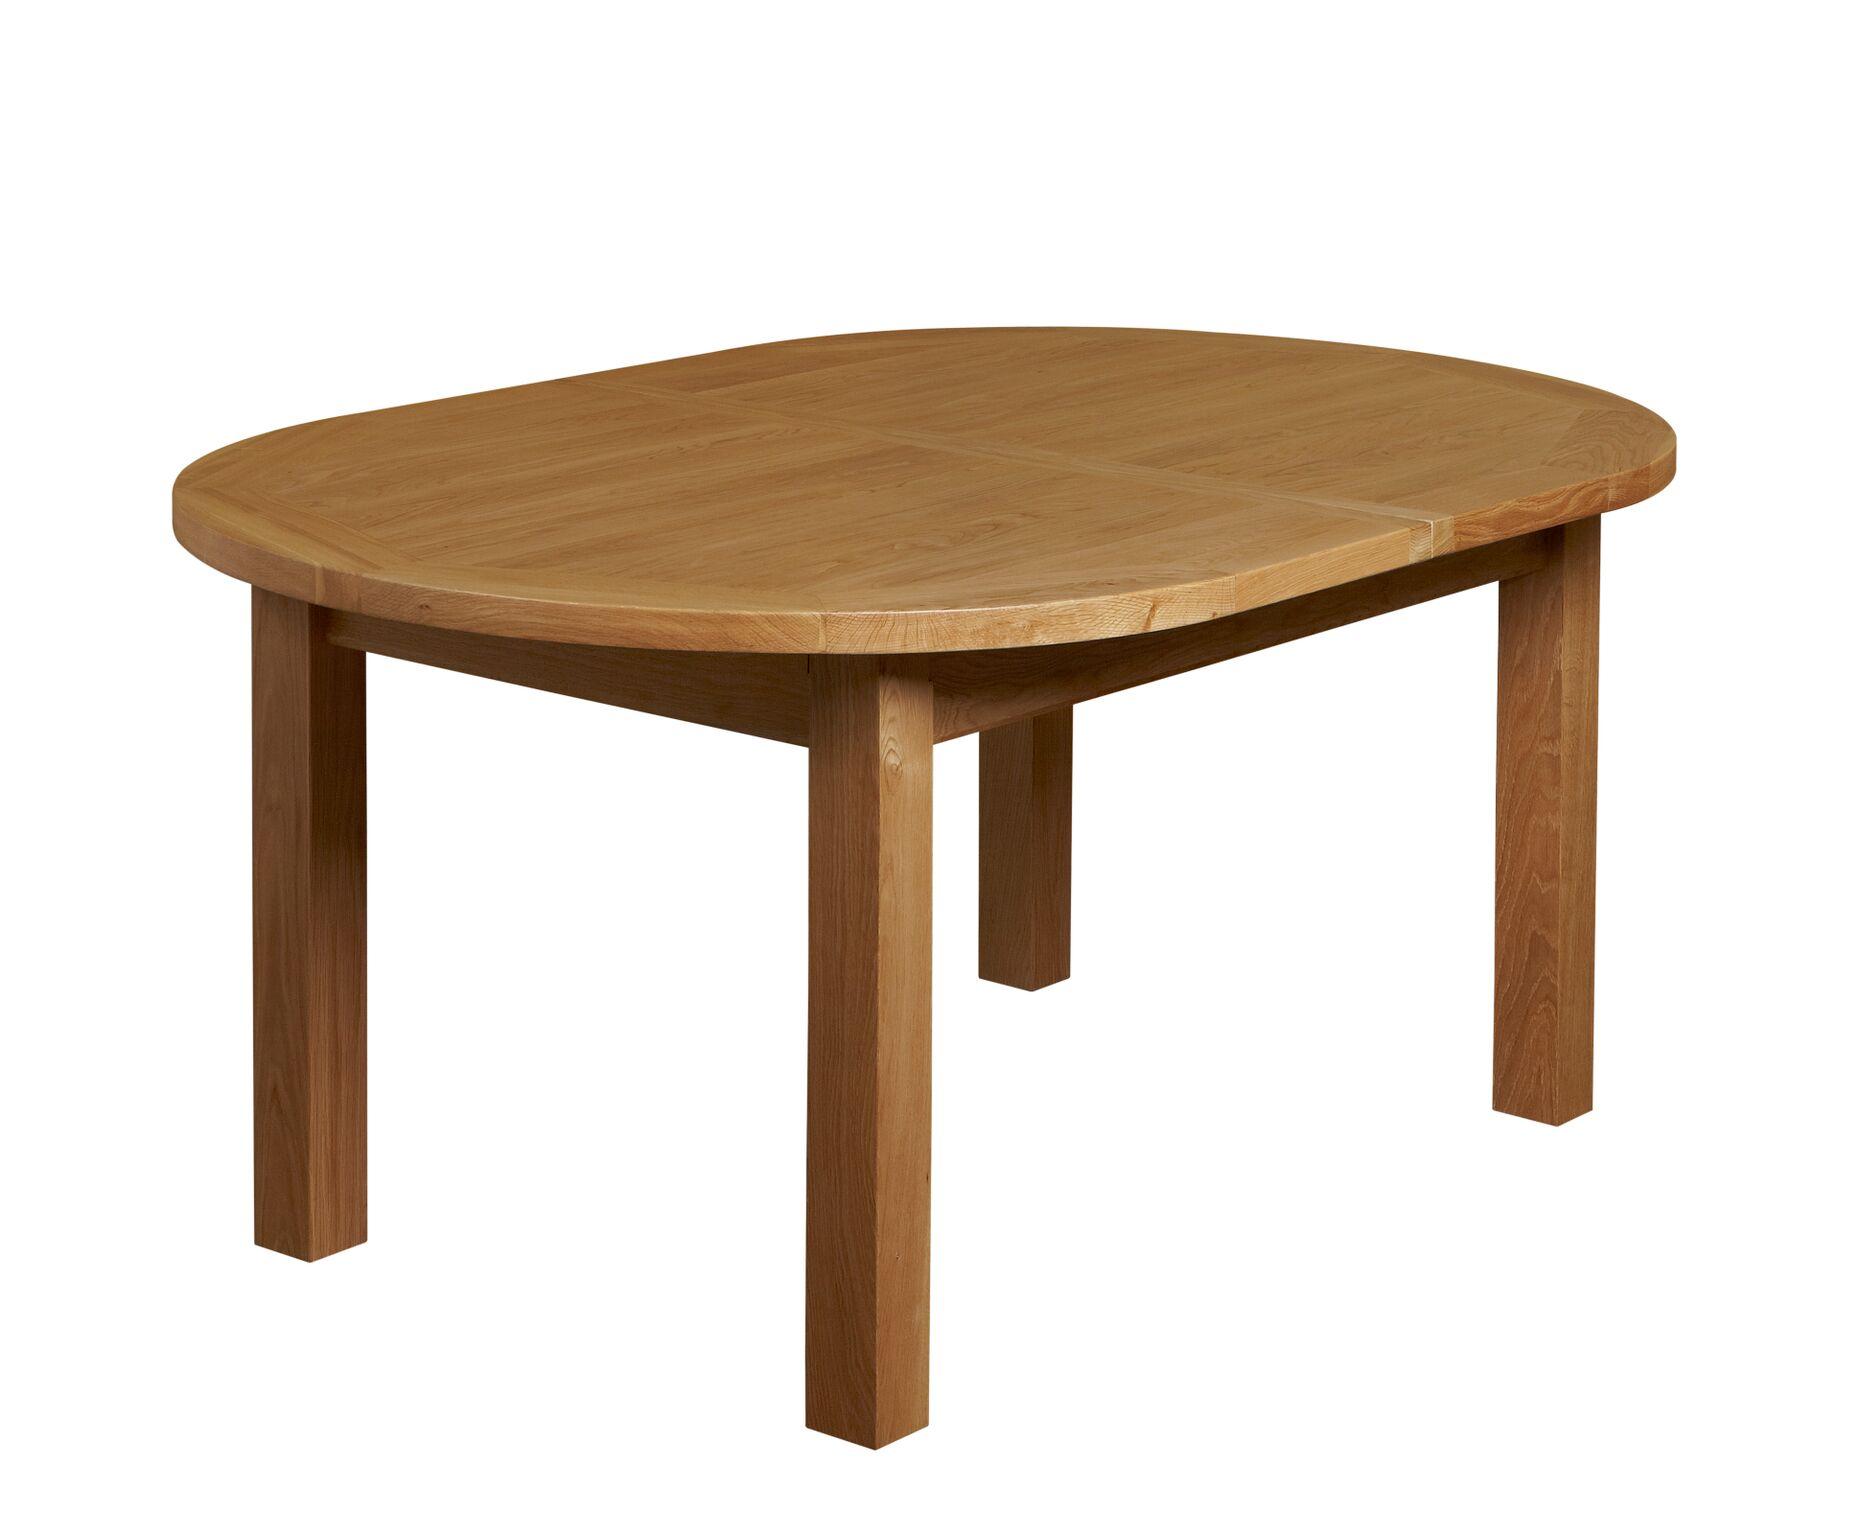 Brampton oak m extending oval table portess